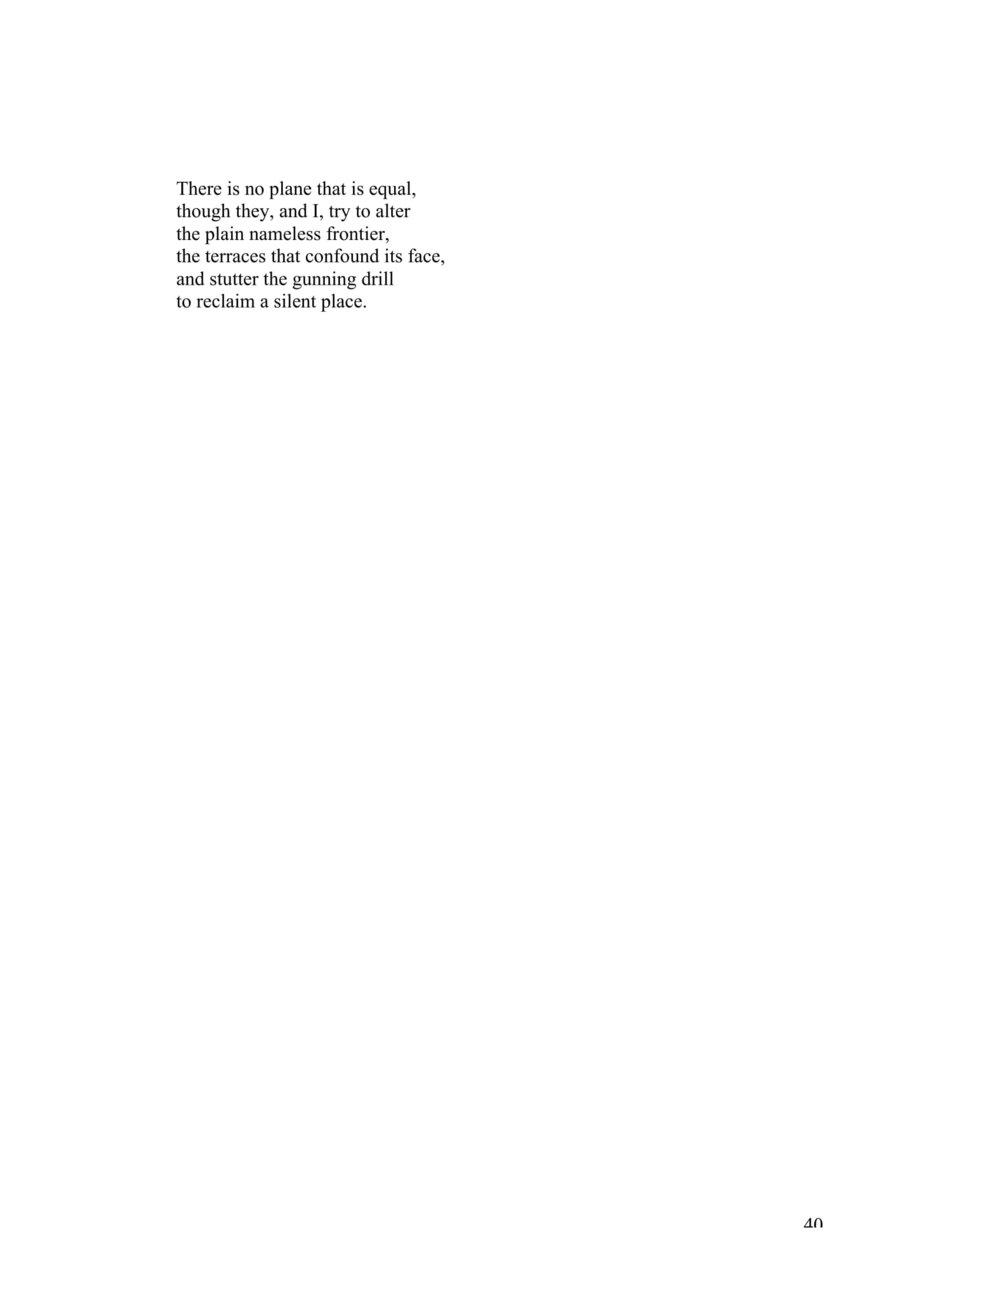 2017.10.31 UNWINDING PAGE-40.jpg